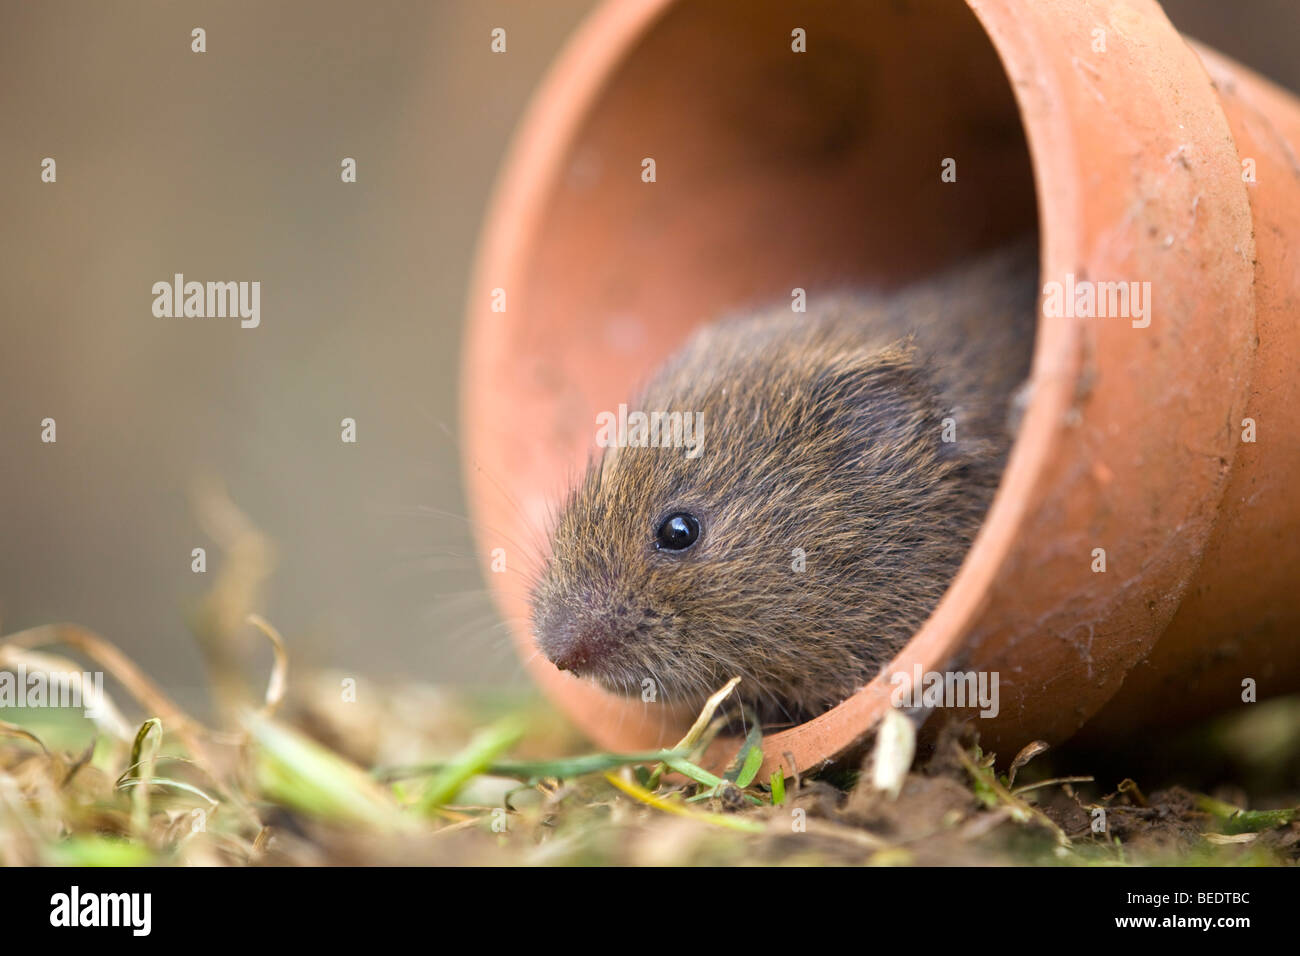 Field vole; Microtus agrestis; in pot - Stock Image